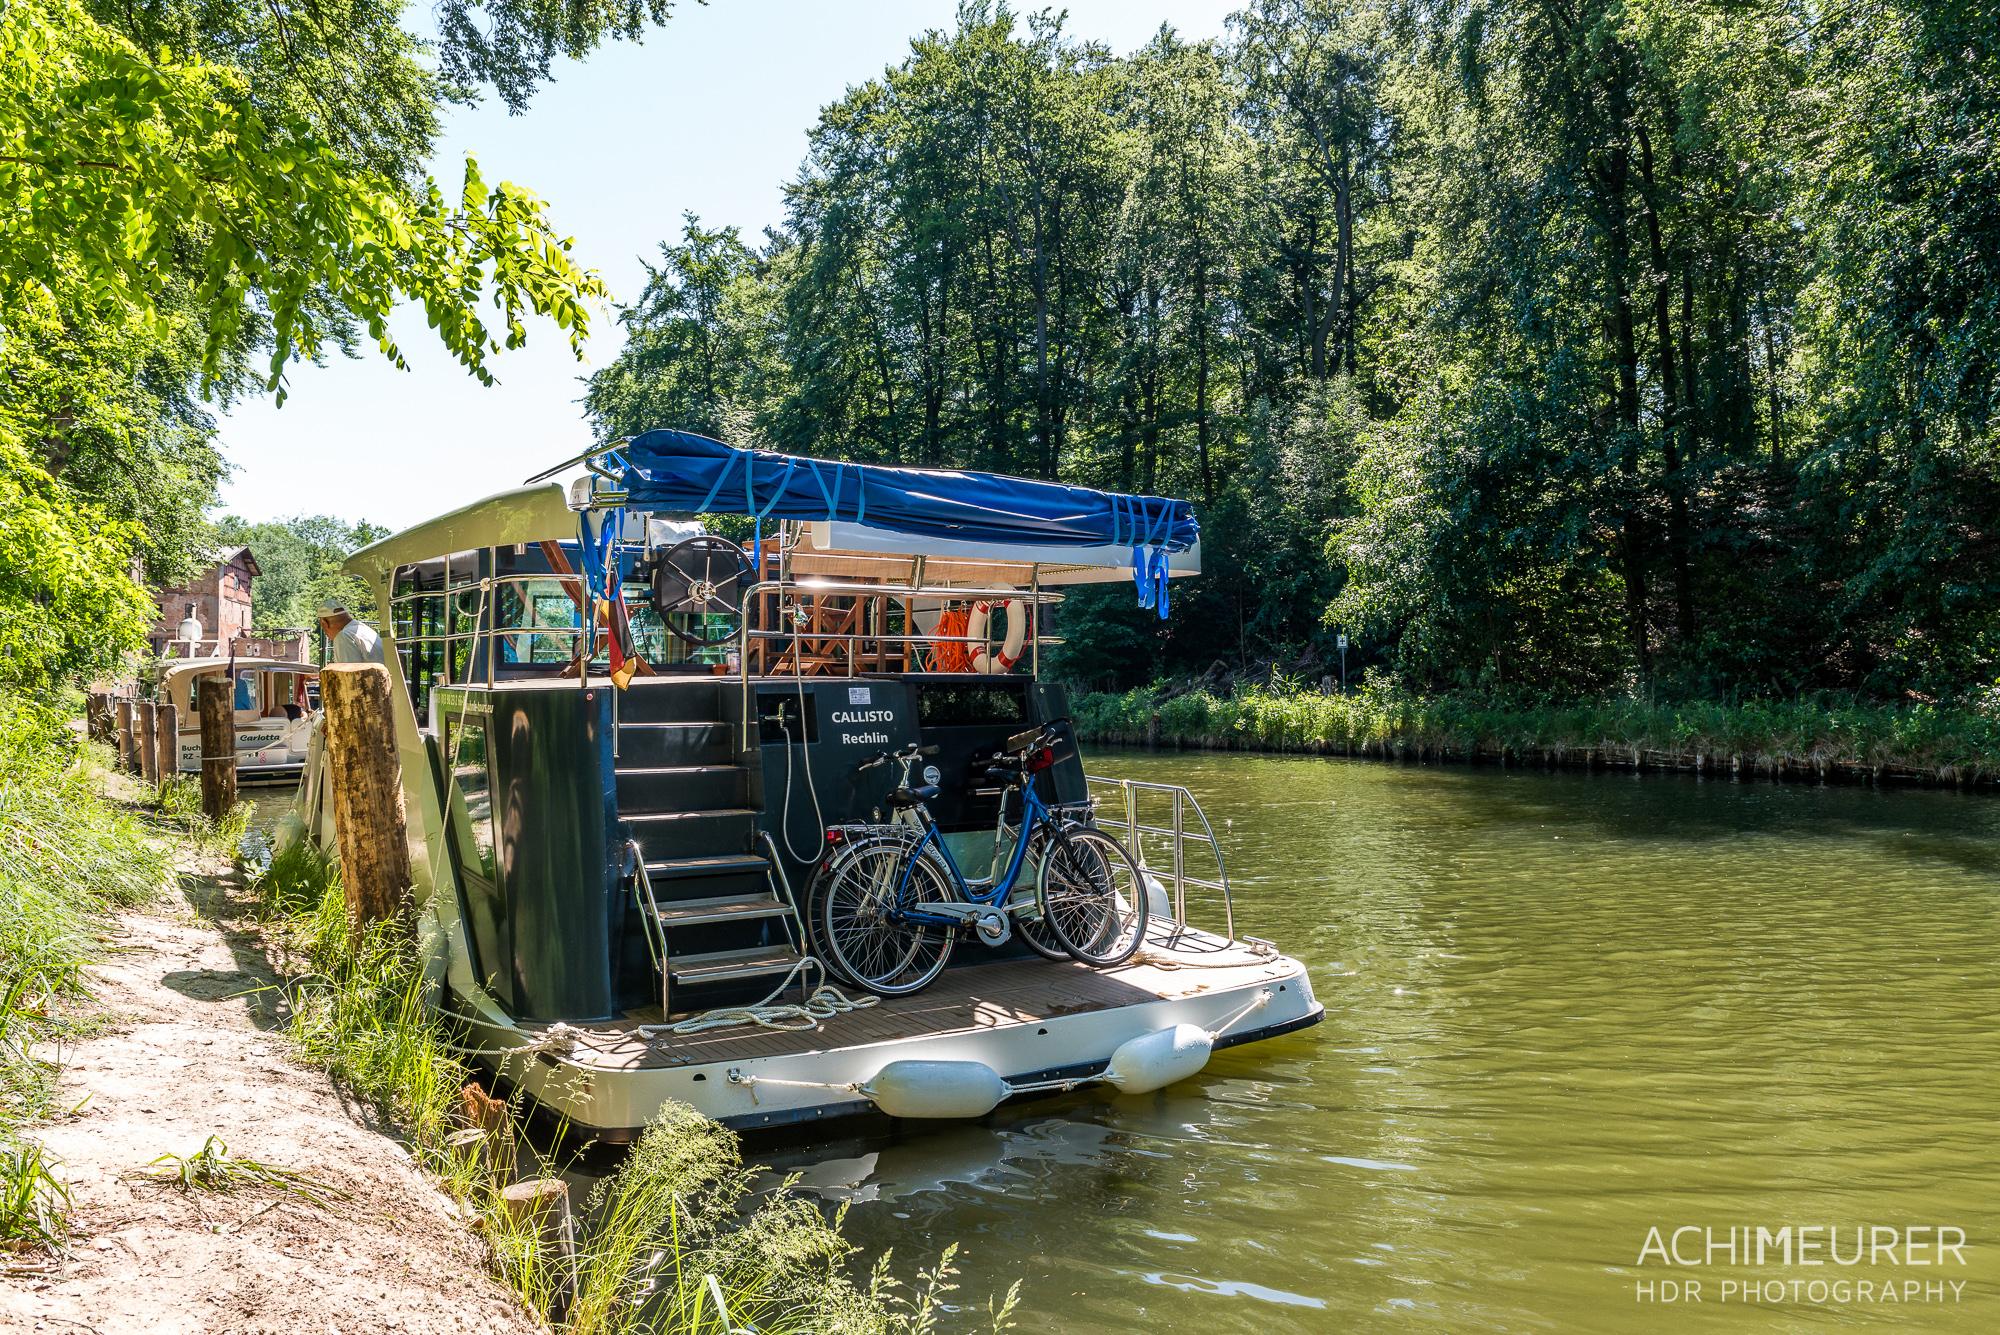 Hausboot-Kuhnle-Mueritz-Mecklenburg-Vorpommern-See_3147